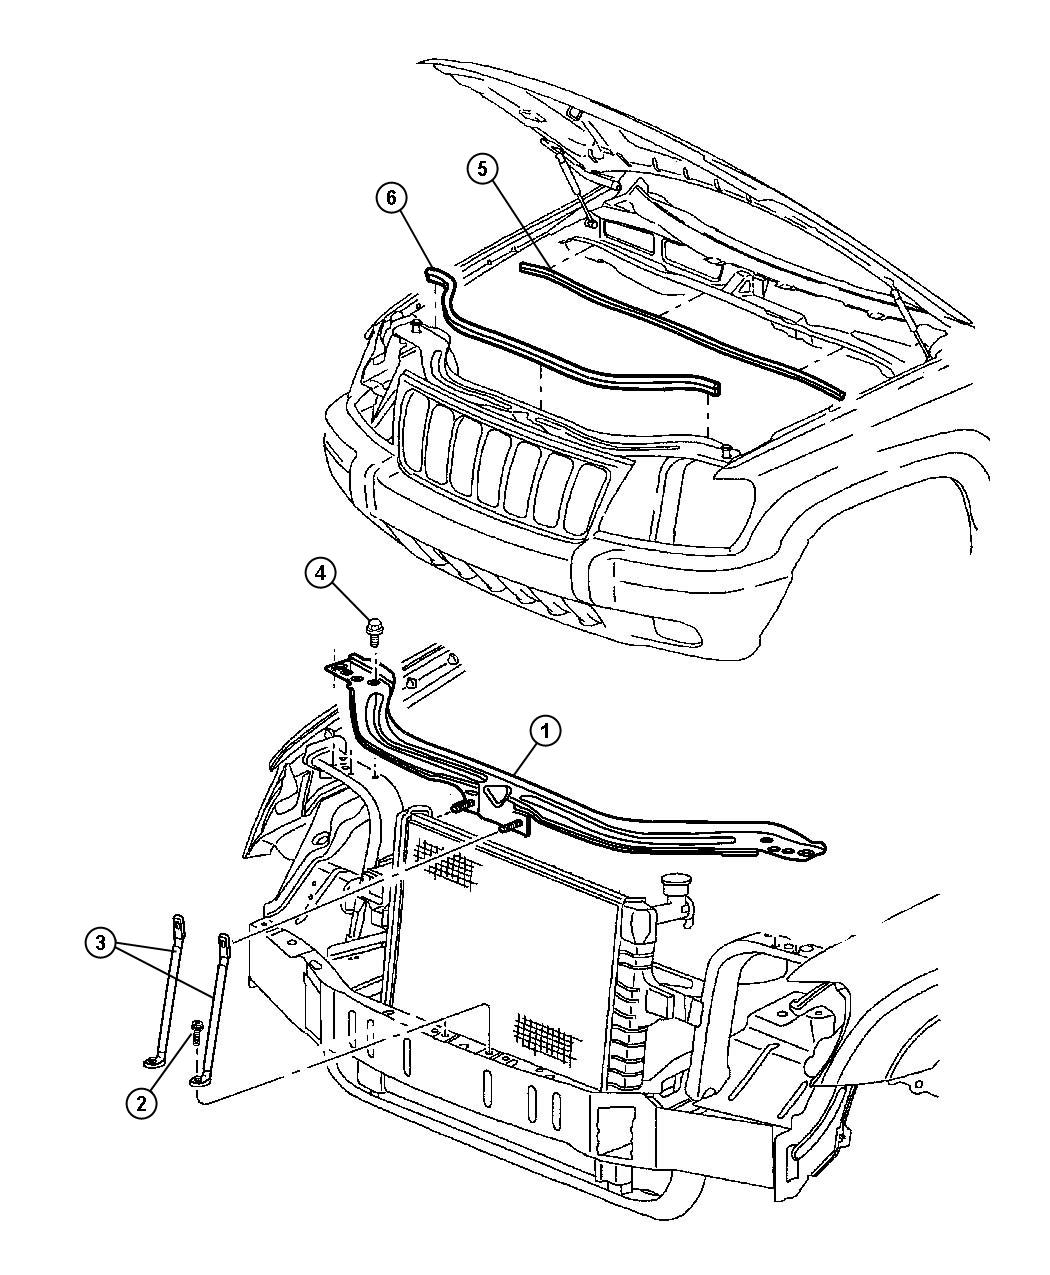 Jeep Cherokee Crossmember Radiator Upper Related